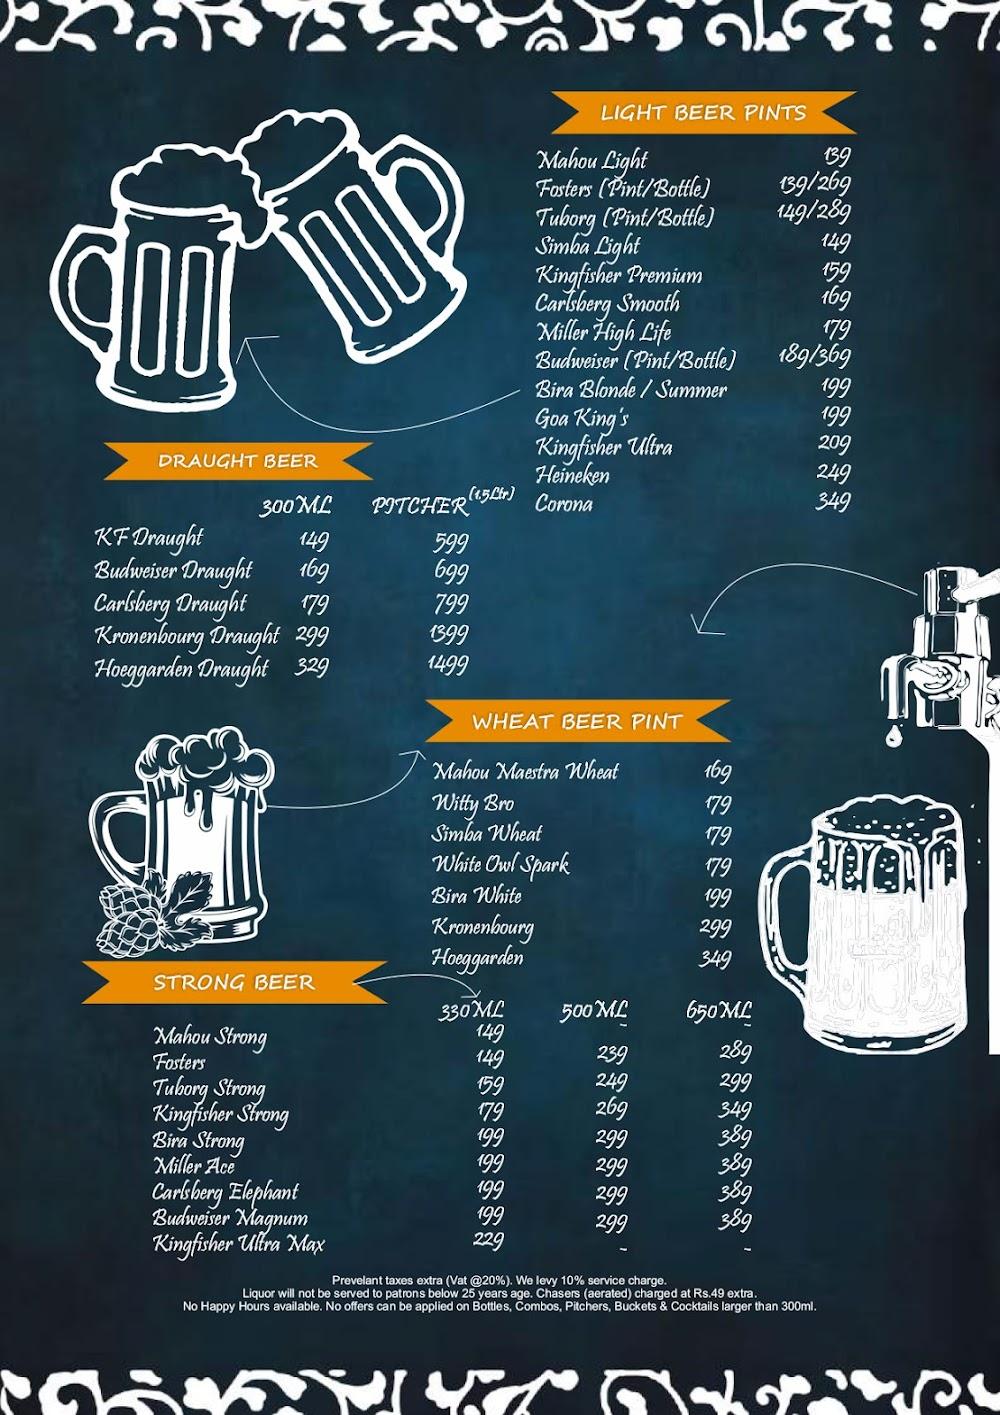 Chill'm Bar & Cafe menu 5